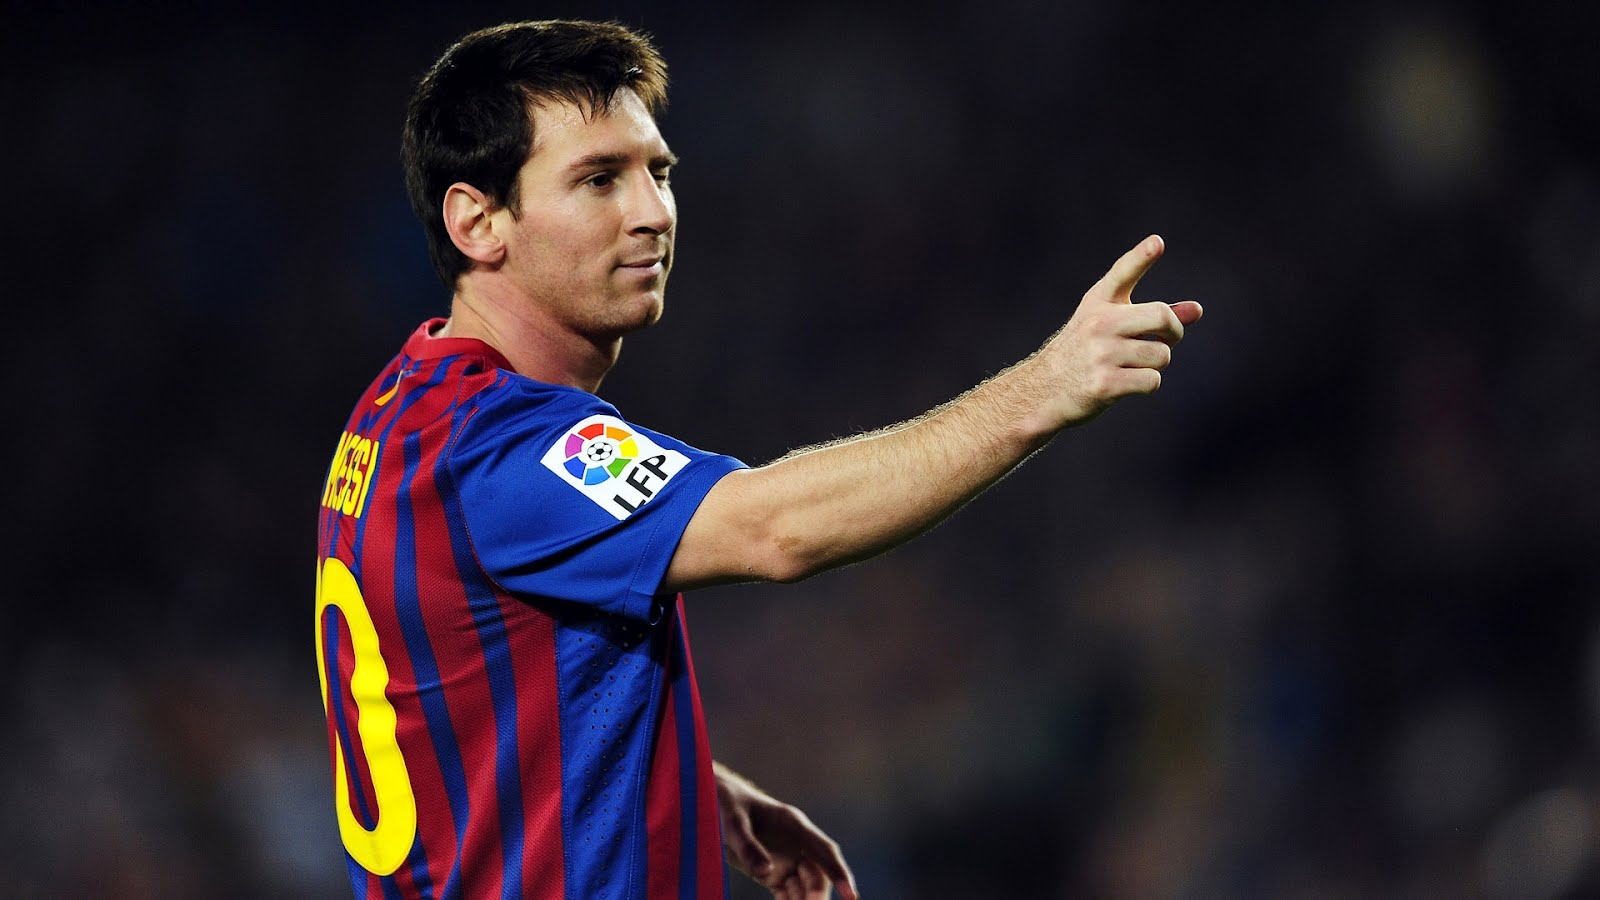 Lionel Messi 10 Wallpaper 2012